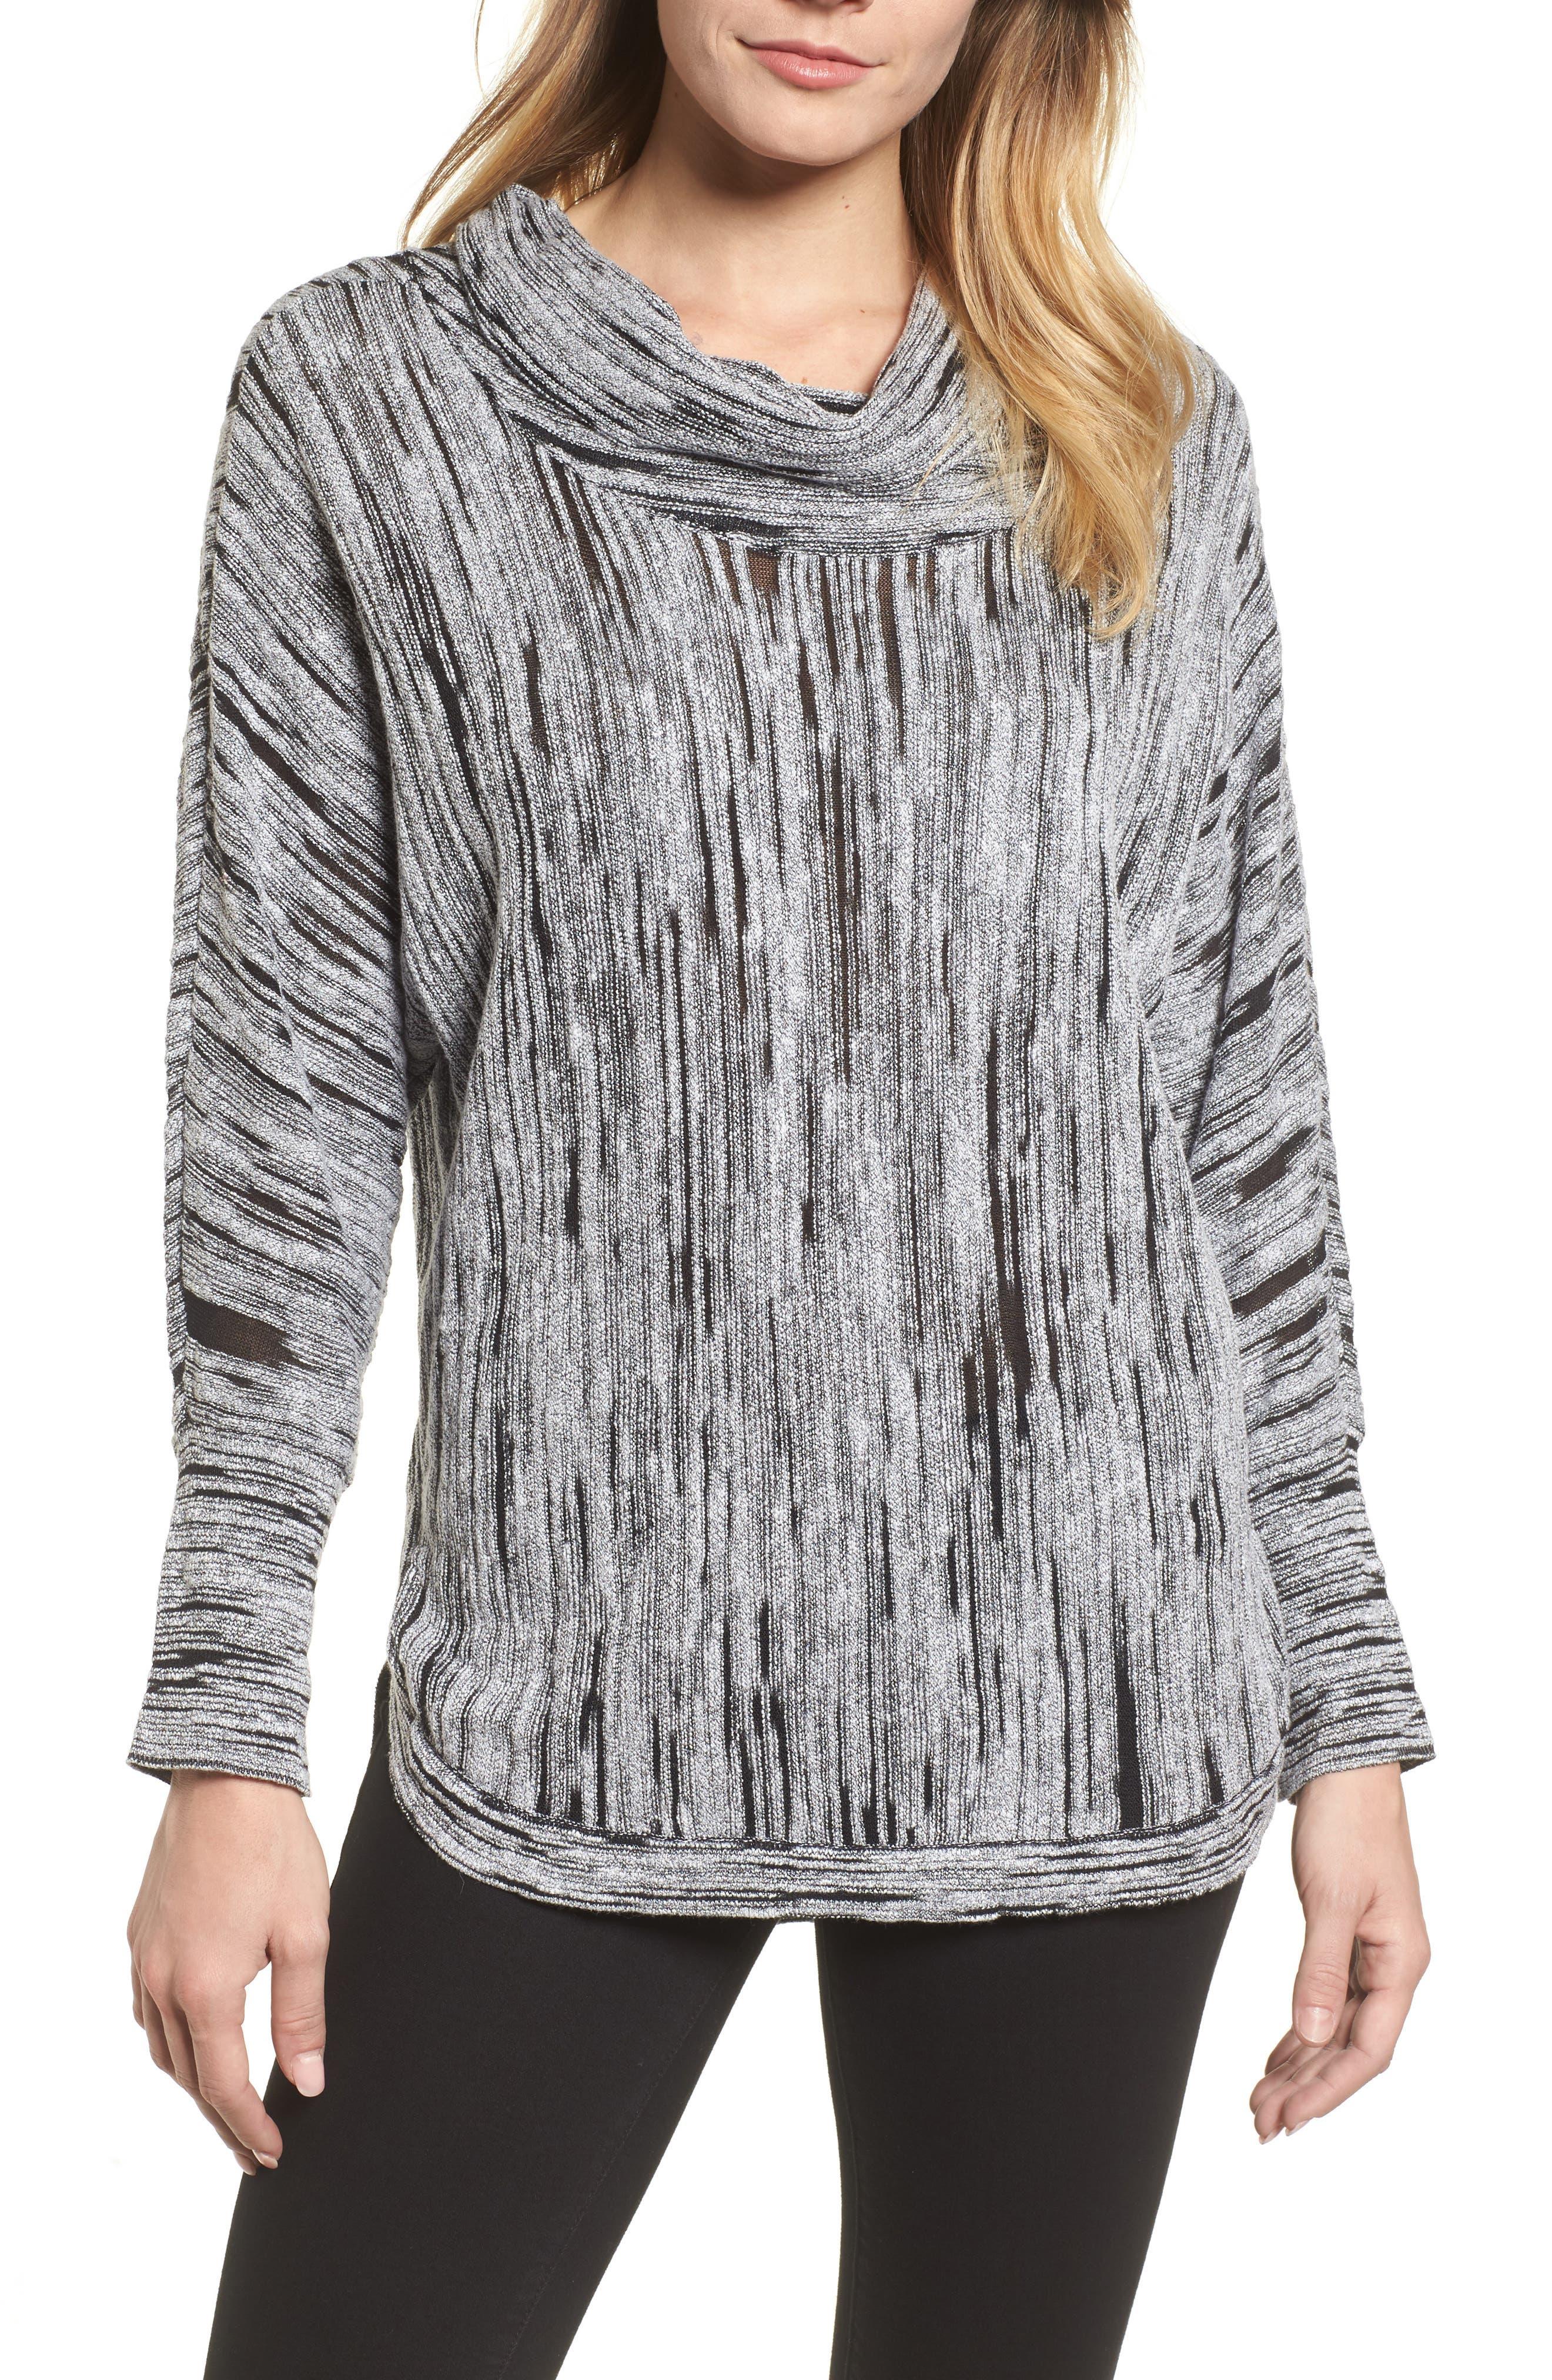 Women's Cowl Neck Sweaters | Nordstrom